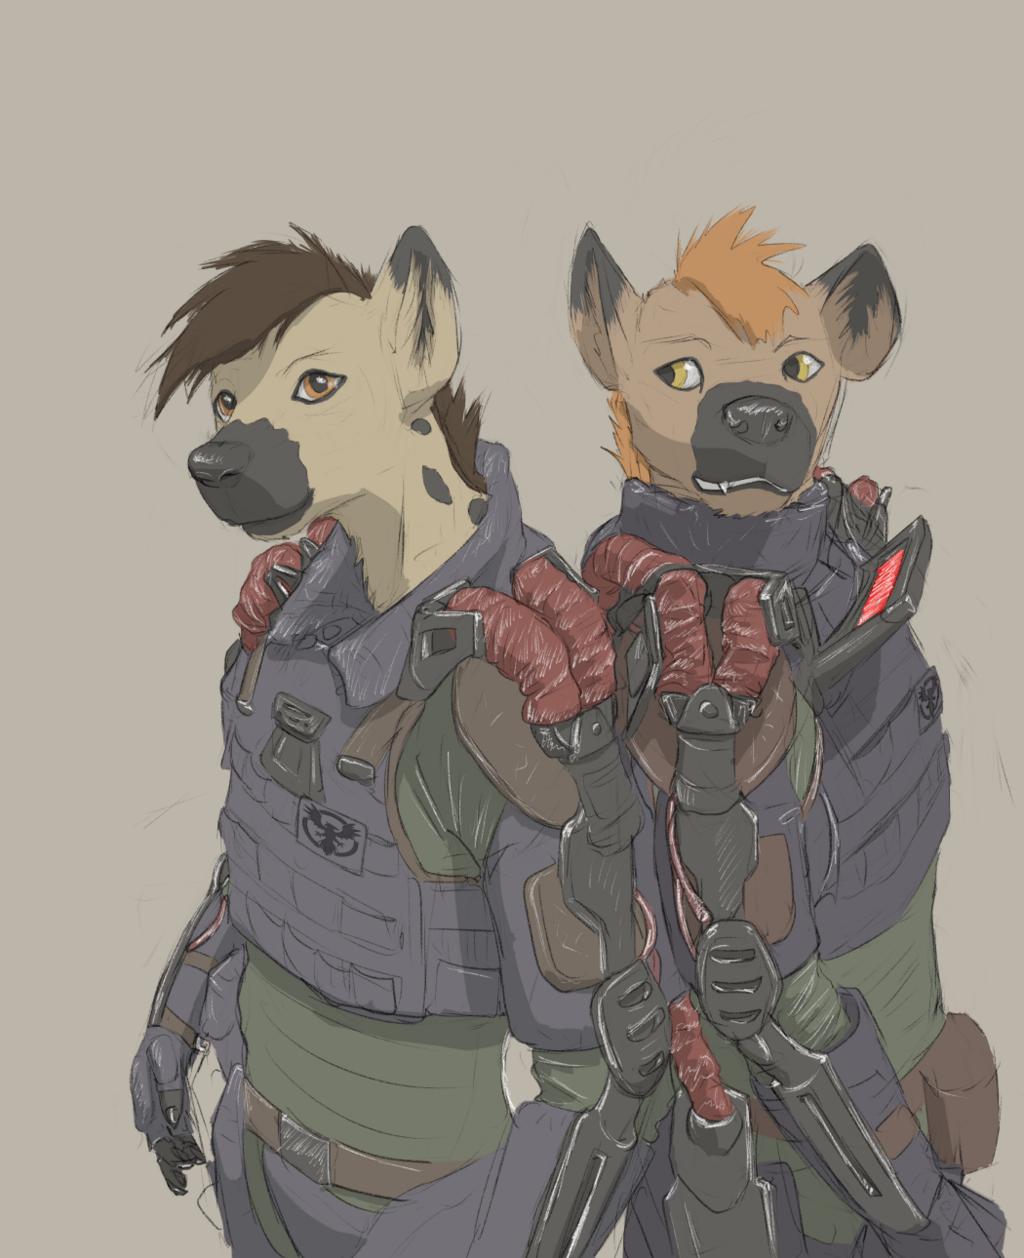 GNOLL BOYS (Commission)